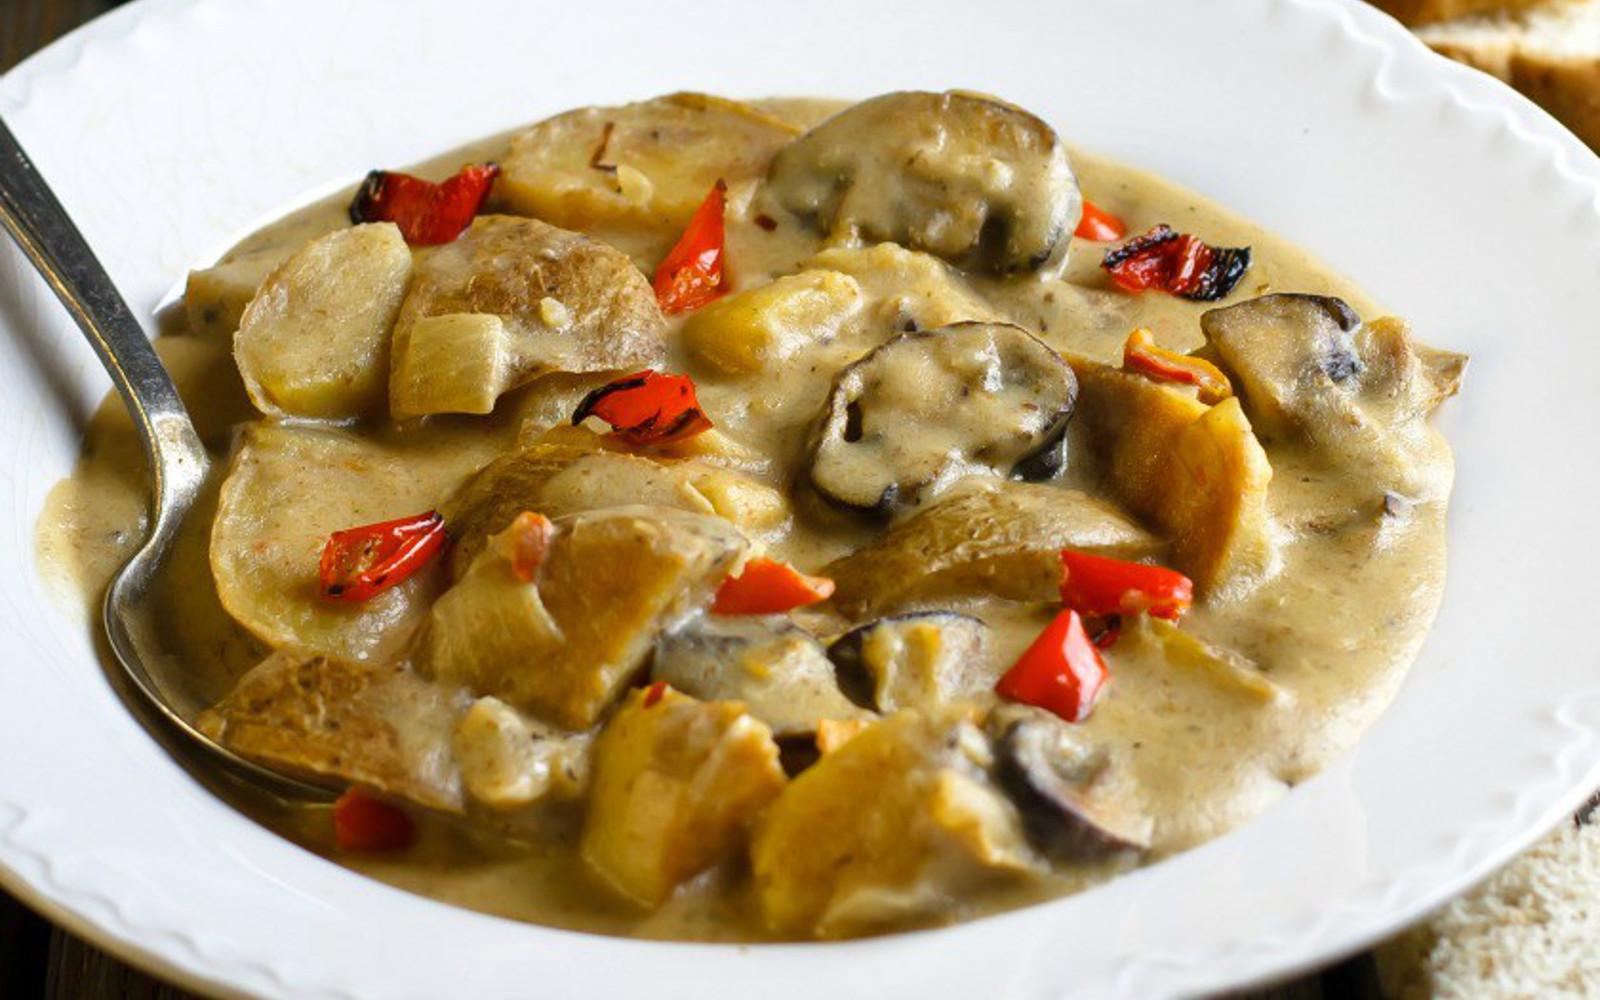 Hearty Potato and Mushroom Stew